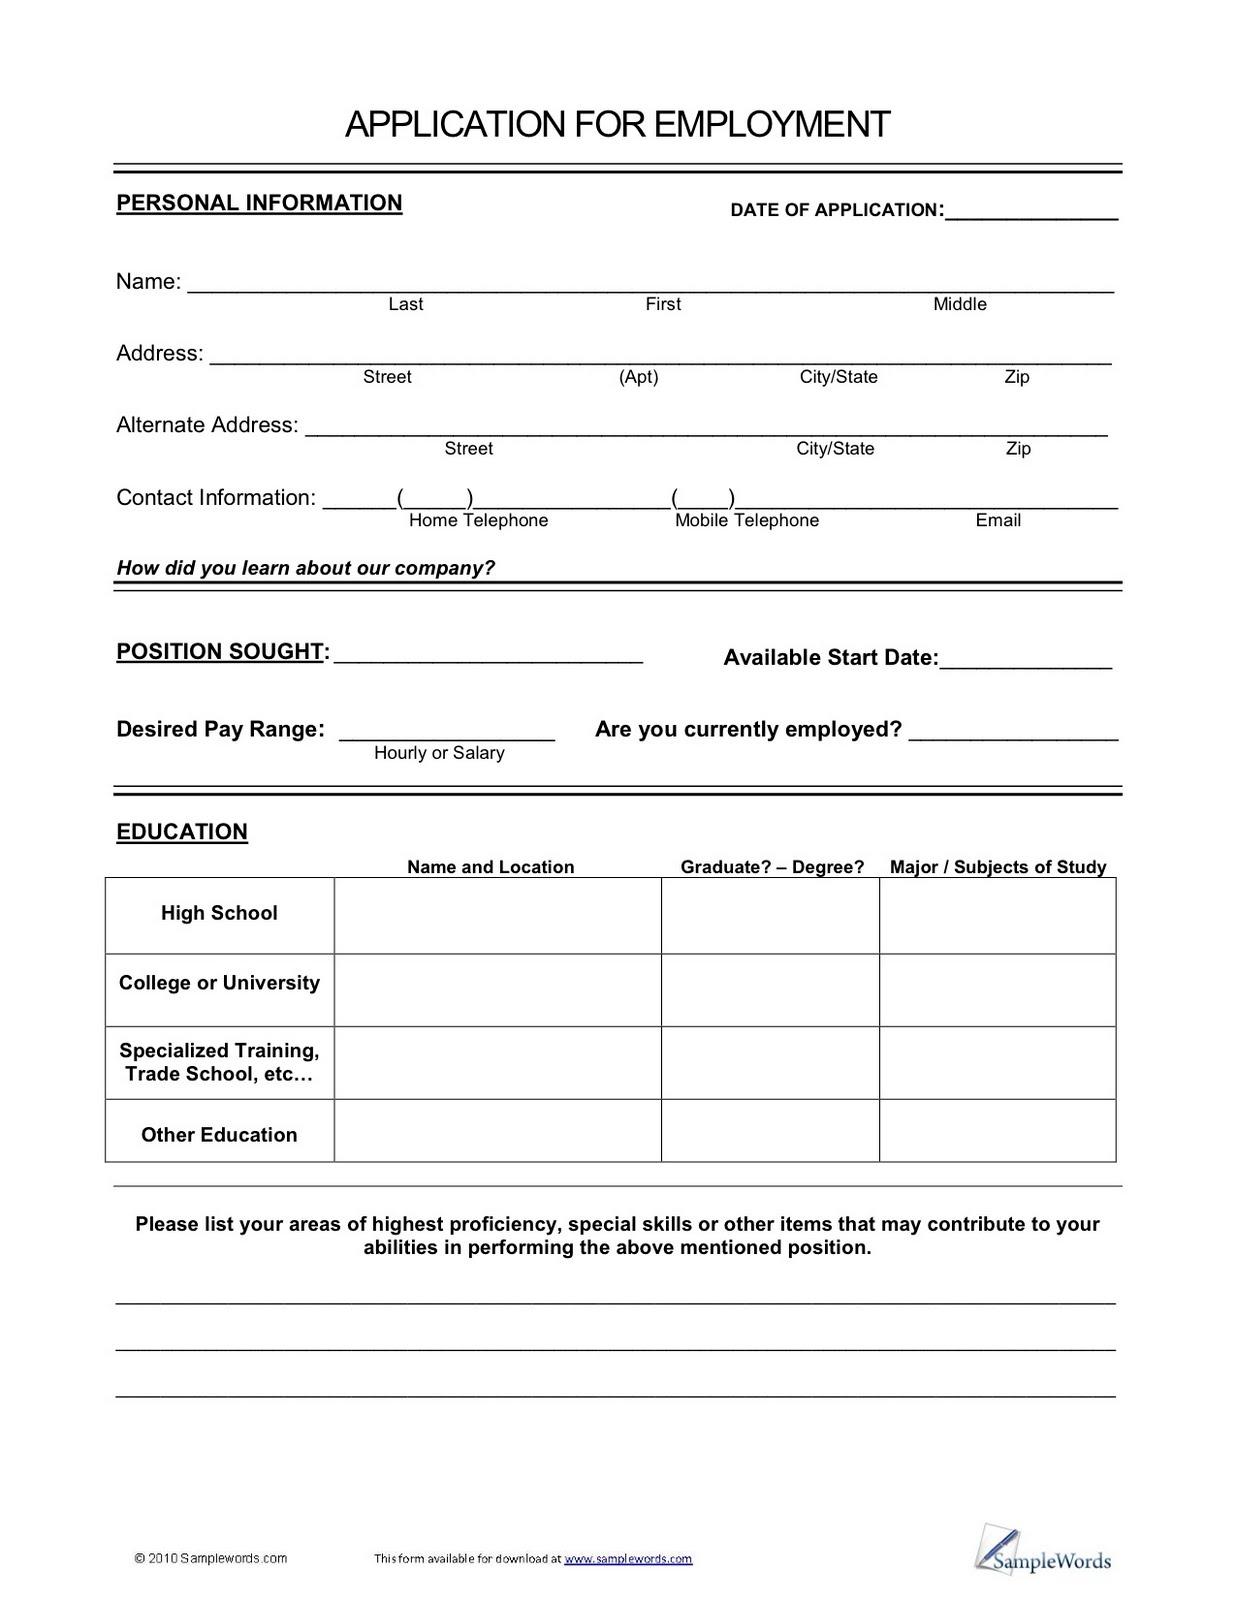 Vons Job Application Form